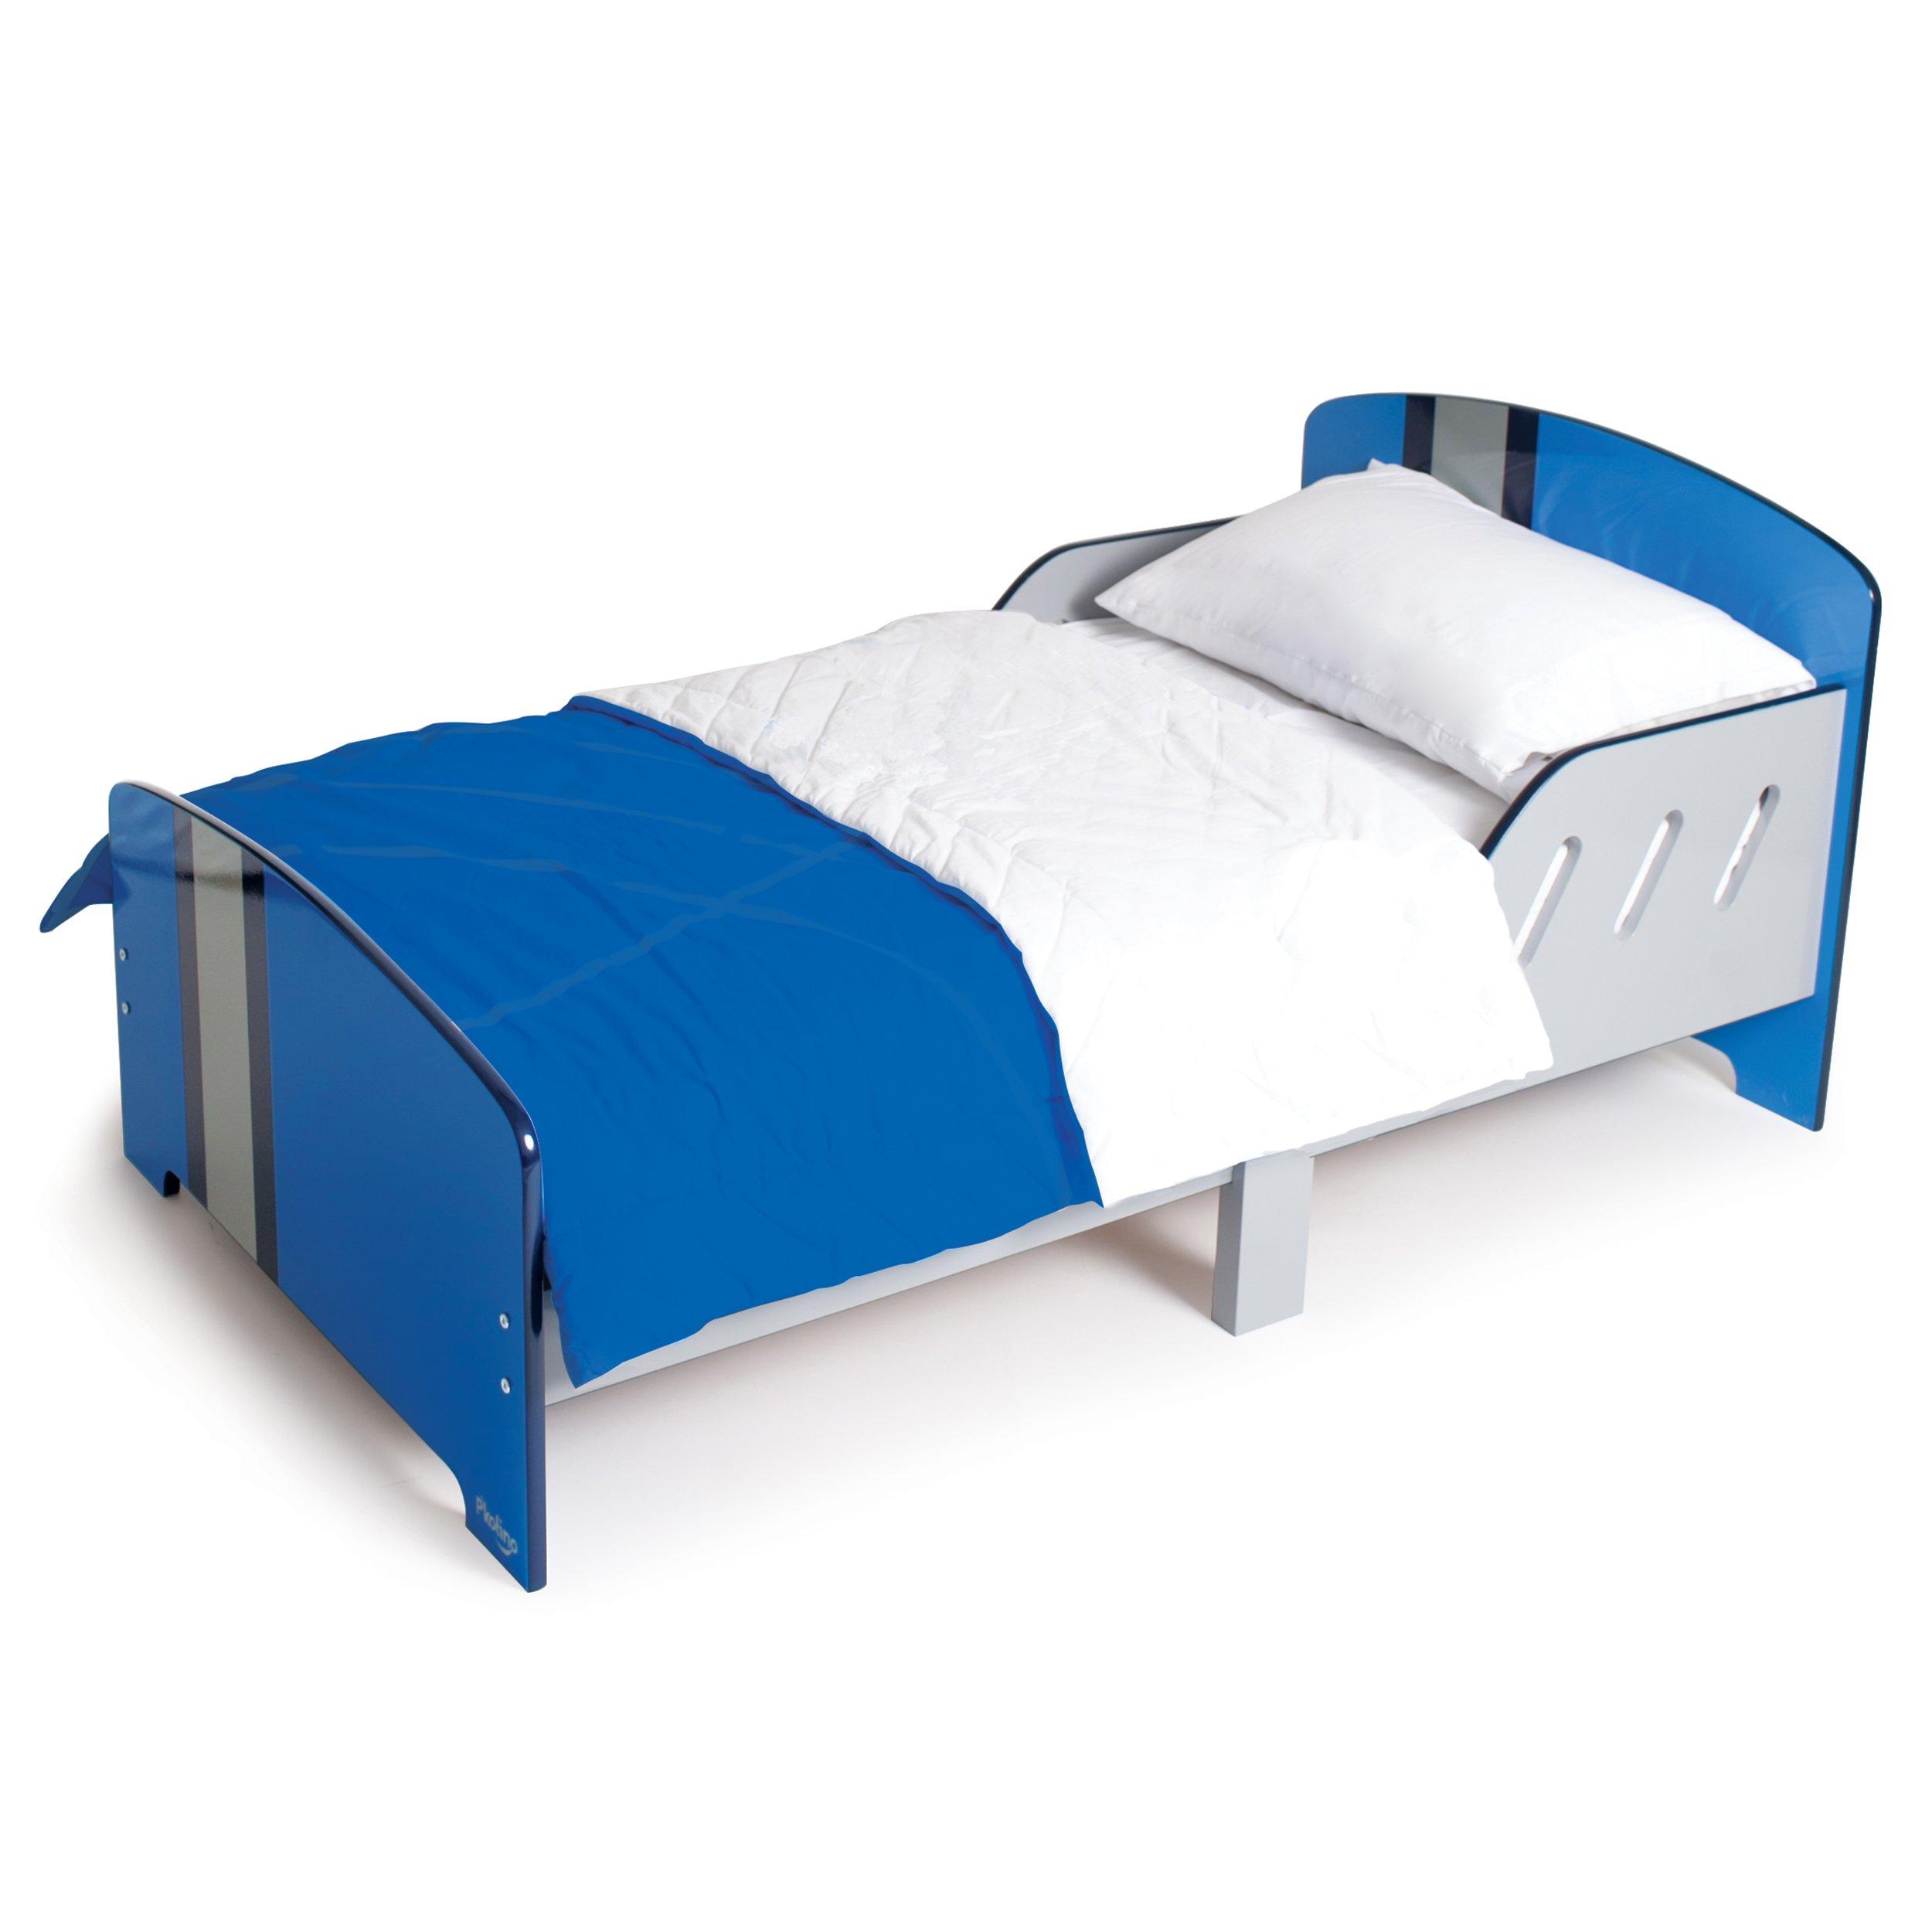 P'Kolino Classically Cool Toddler Bed, Racing Stripes by P'Kolino